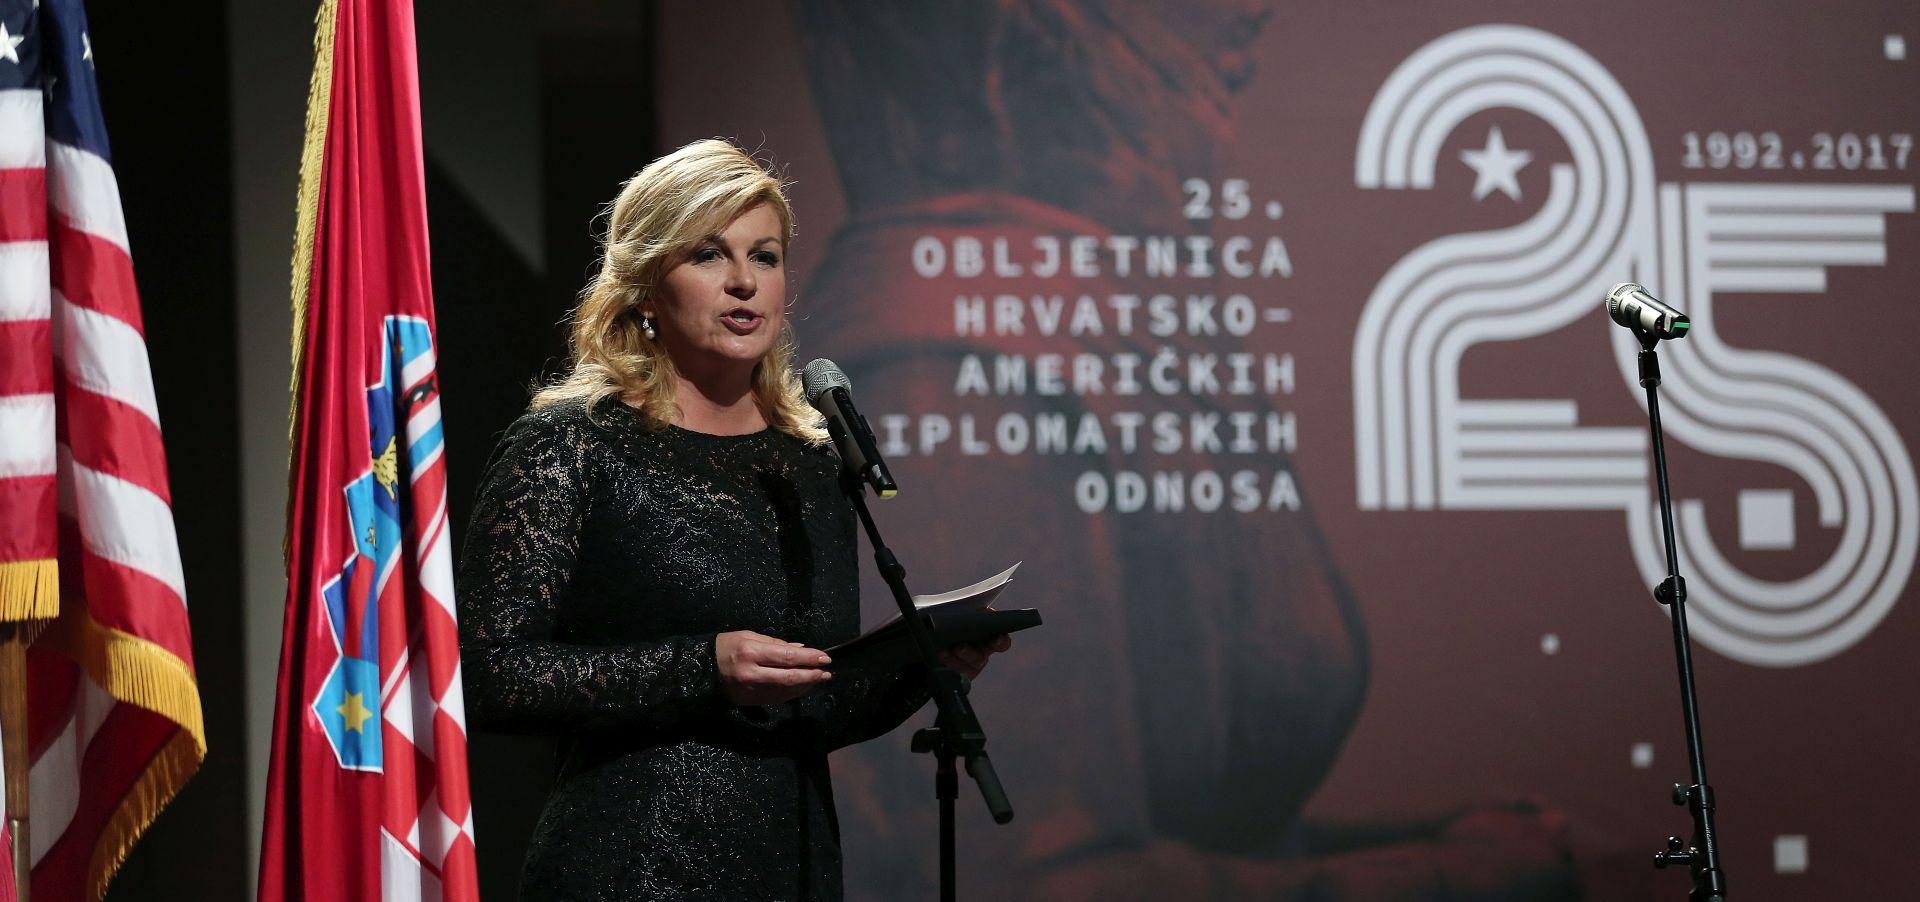 Svečano obilježena 25. obljetnica hrvatsko-američkih diplomatskih odnosa